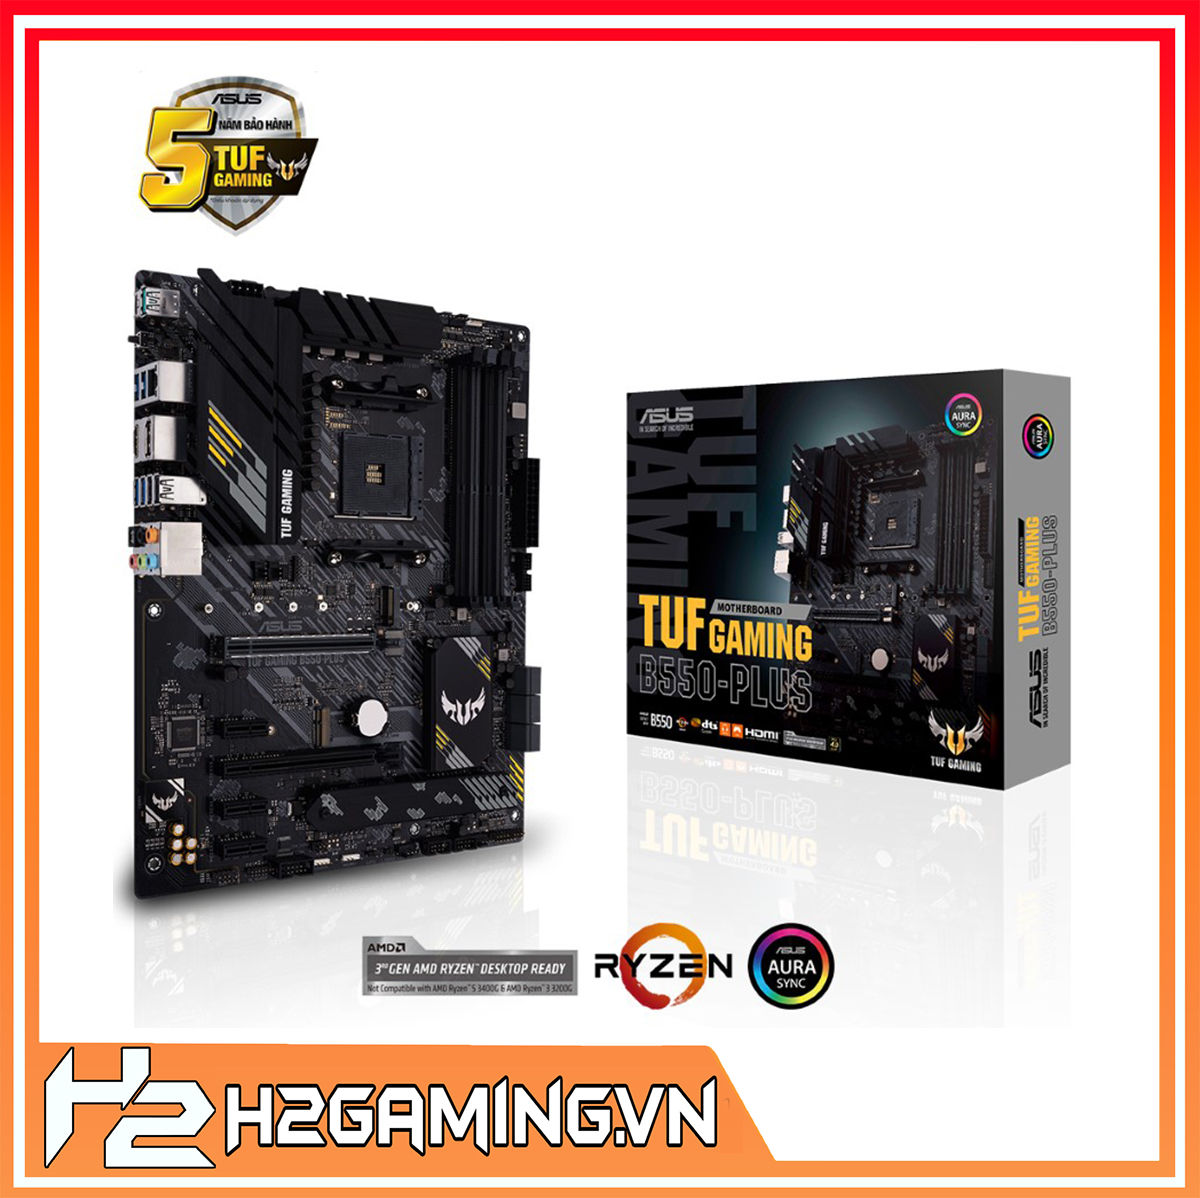 Mainboard_ASUS_TUF_GAMING_B550-PLUS_(AMD_B550,_Socket_AM4,_ATX,_4_khe_RAM_DRR4)1